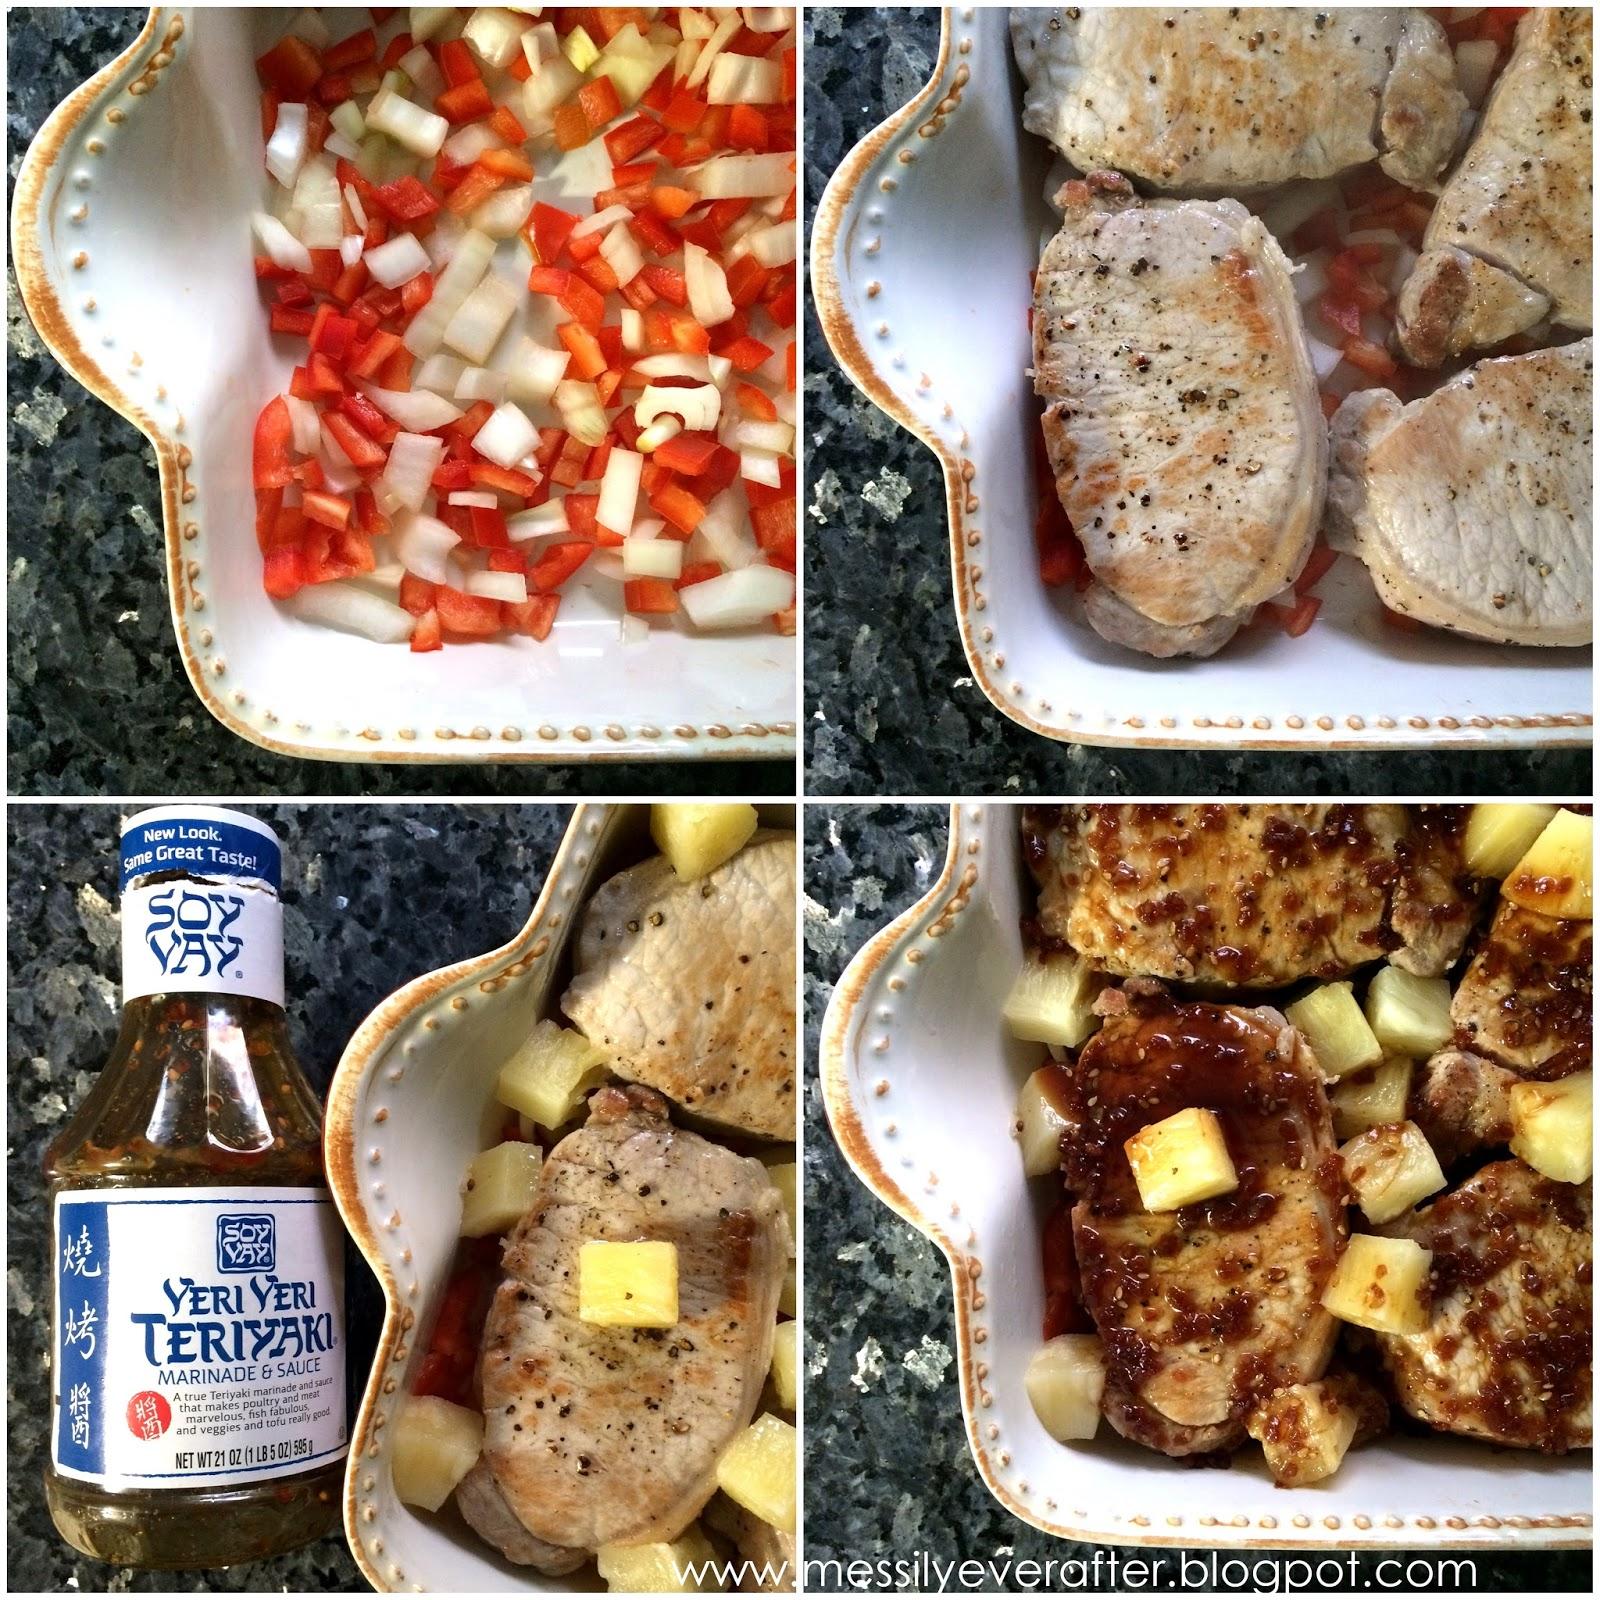 Baked teriyaki pork chop recipe